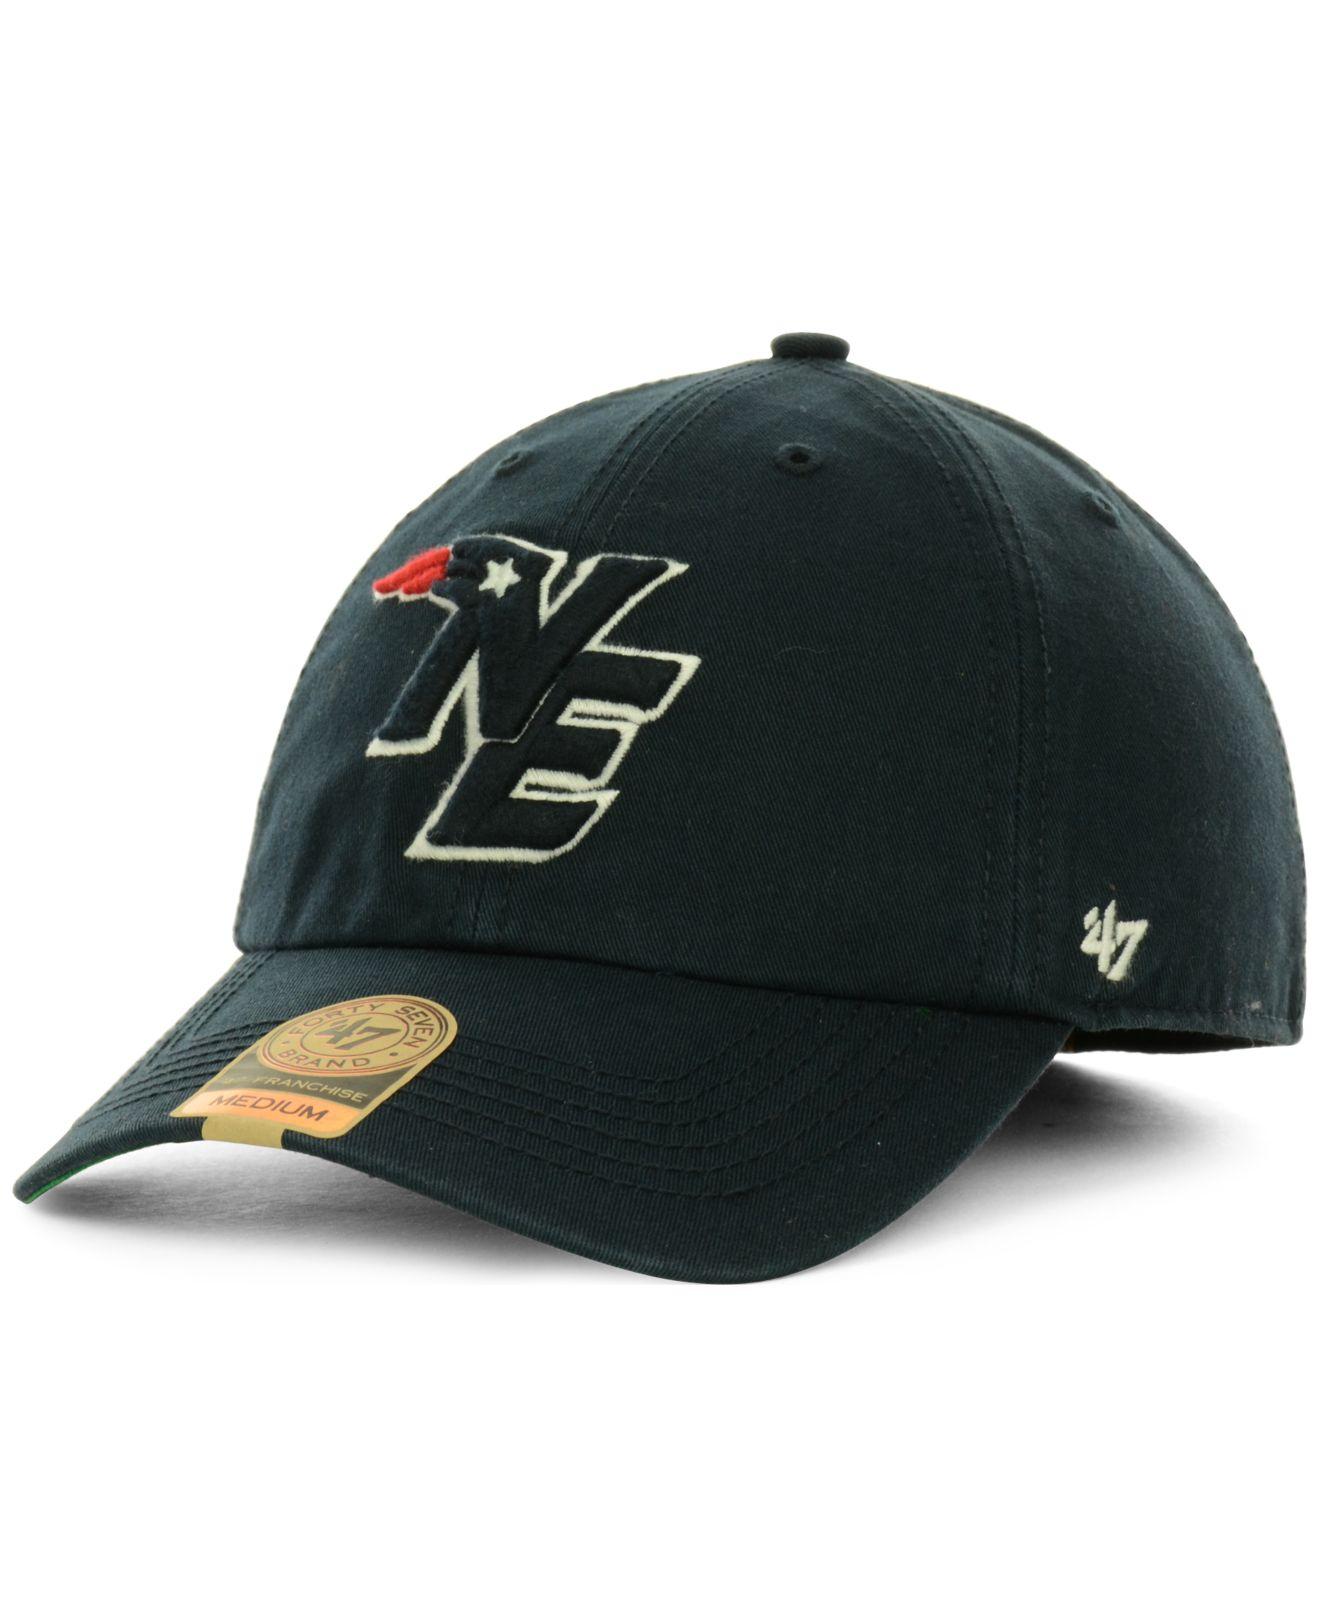 0b7538ec8 Lyst - 47 Brand New England Patriots Franchise Hat in Blue for Men